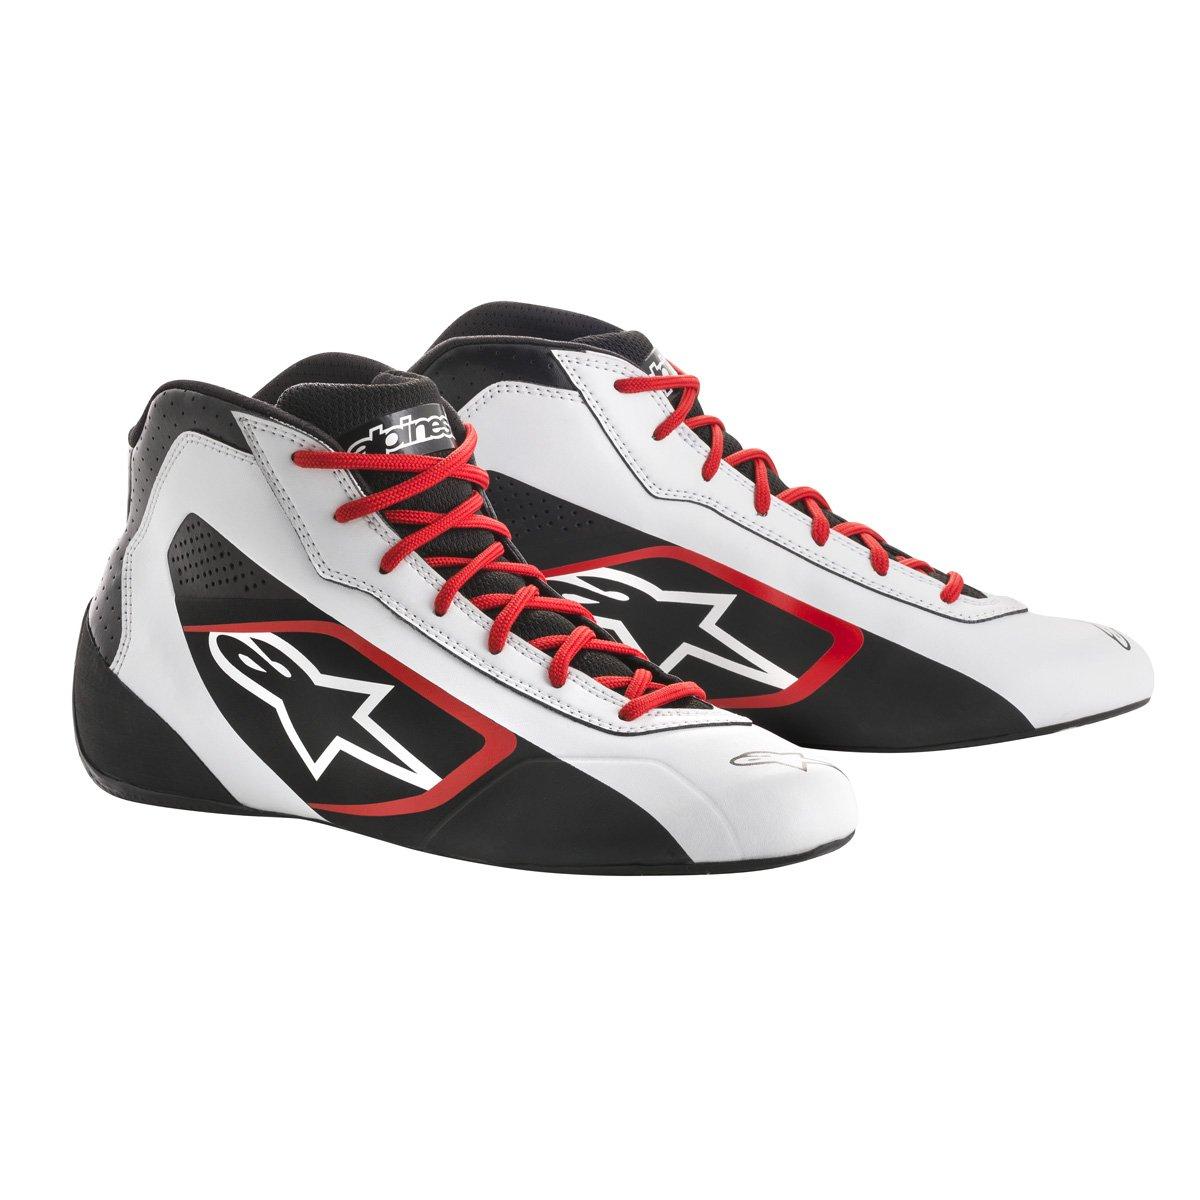 Alpinestars 2711518-213-8 Tech 1-K Start Shoes, Black/White/Red, Size 8